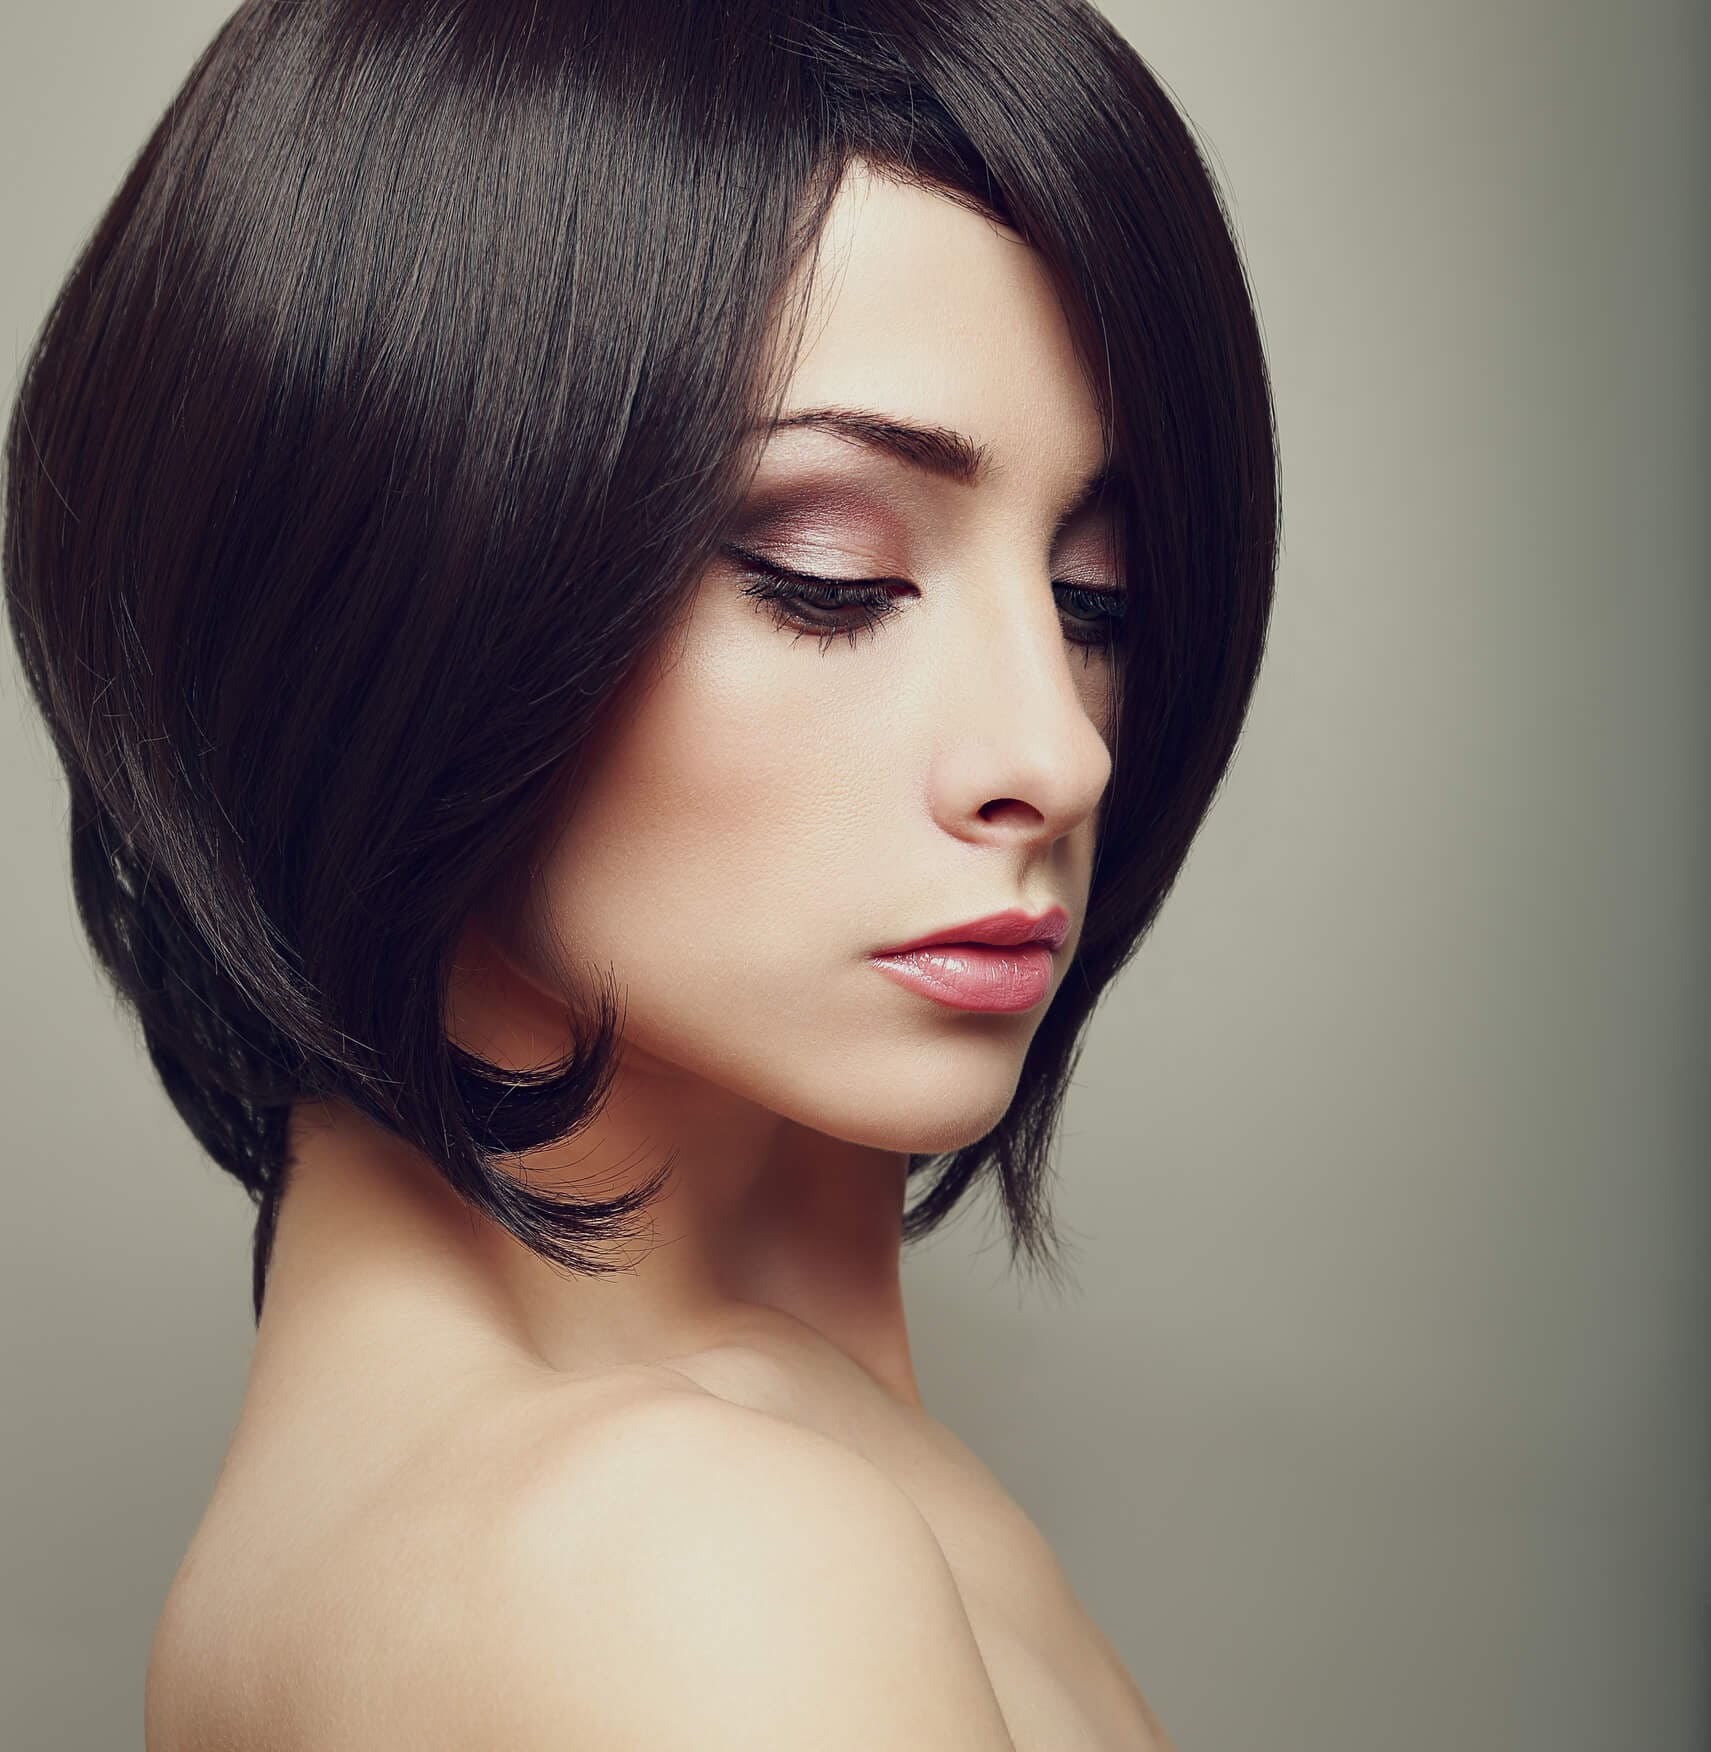 peinados para caras cuadradas lob en capas